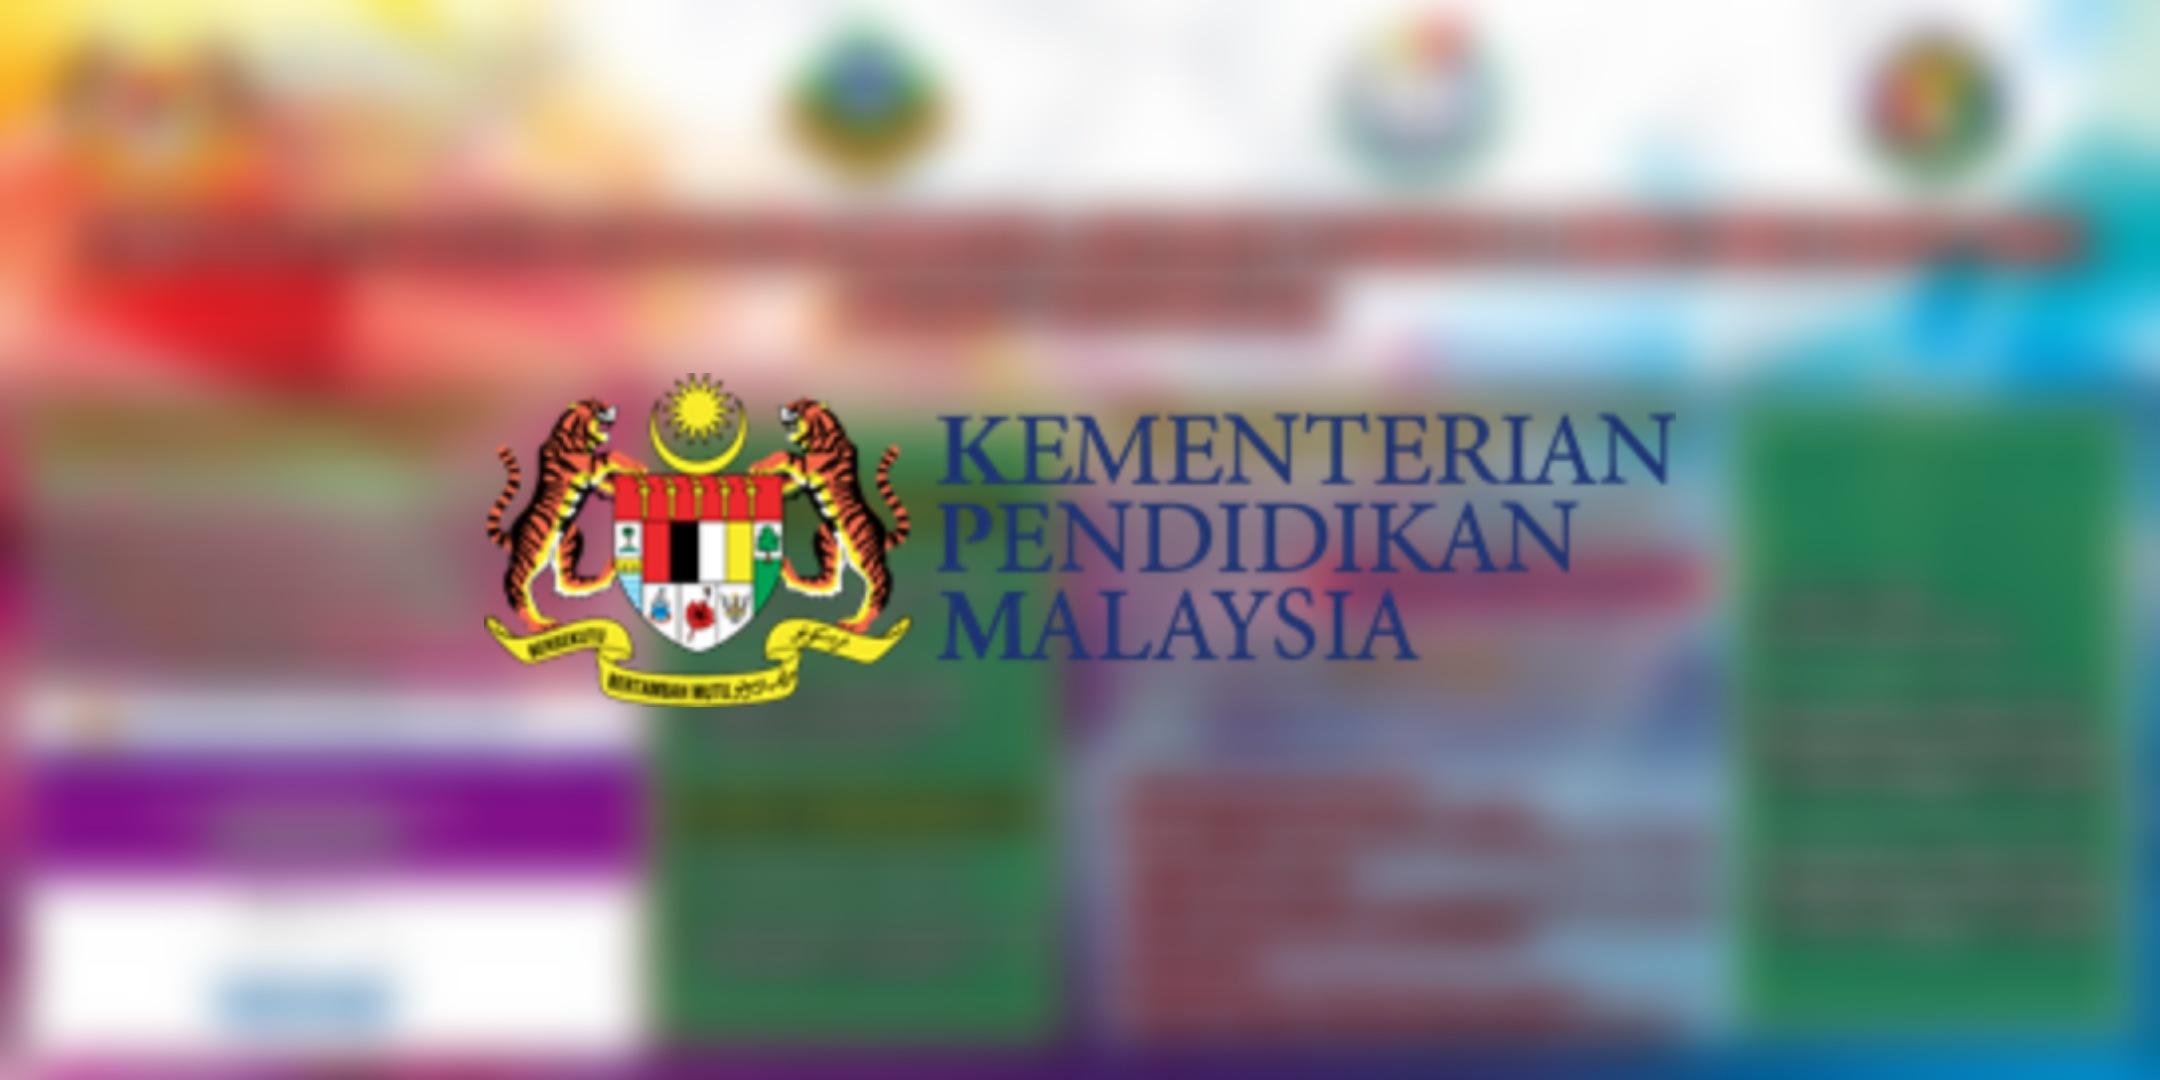 Permohonan Prasekolah KPM 2022 Online (Borang)